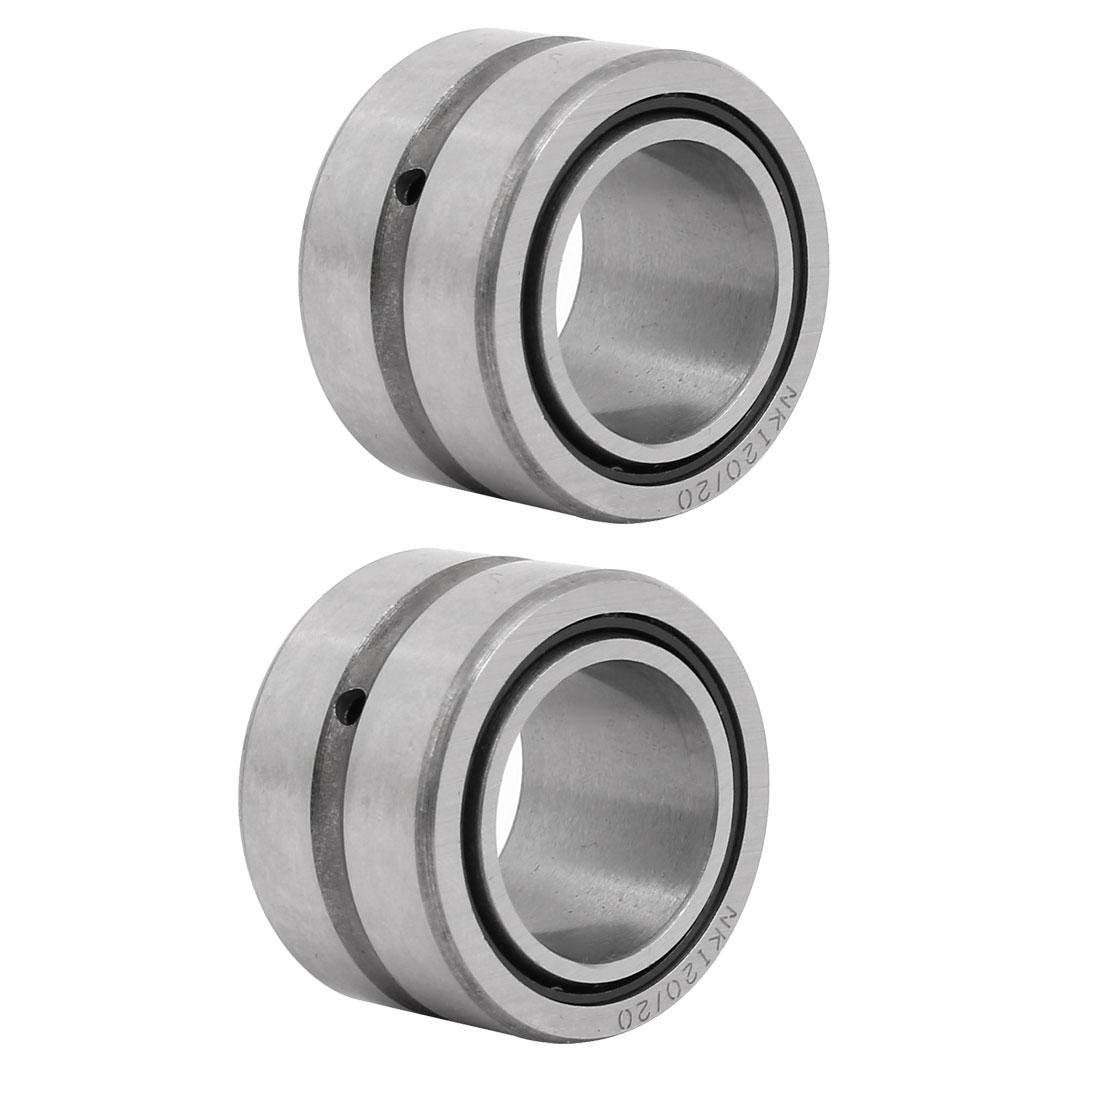 NKI20/20 20mmx32mmx20mm Inner Ring Needle Roller Bearing Silver Tone 2pcs